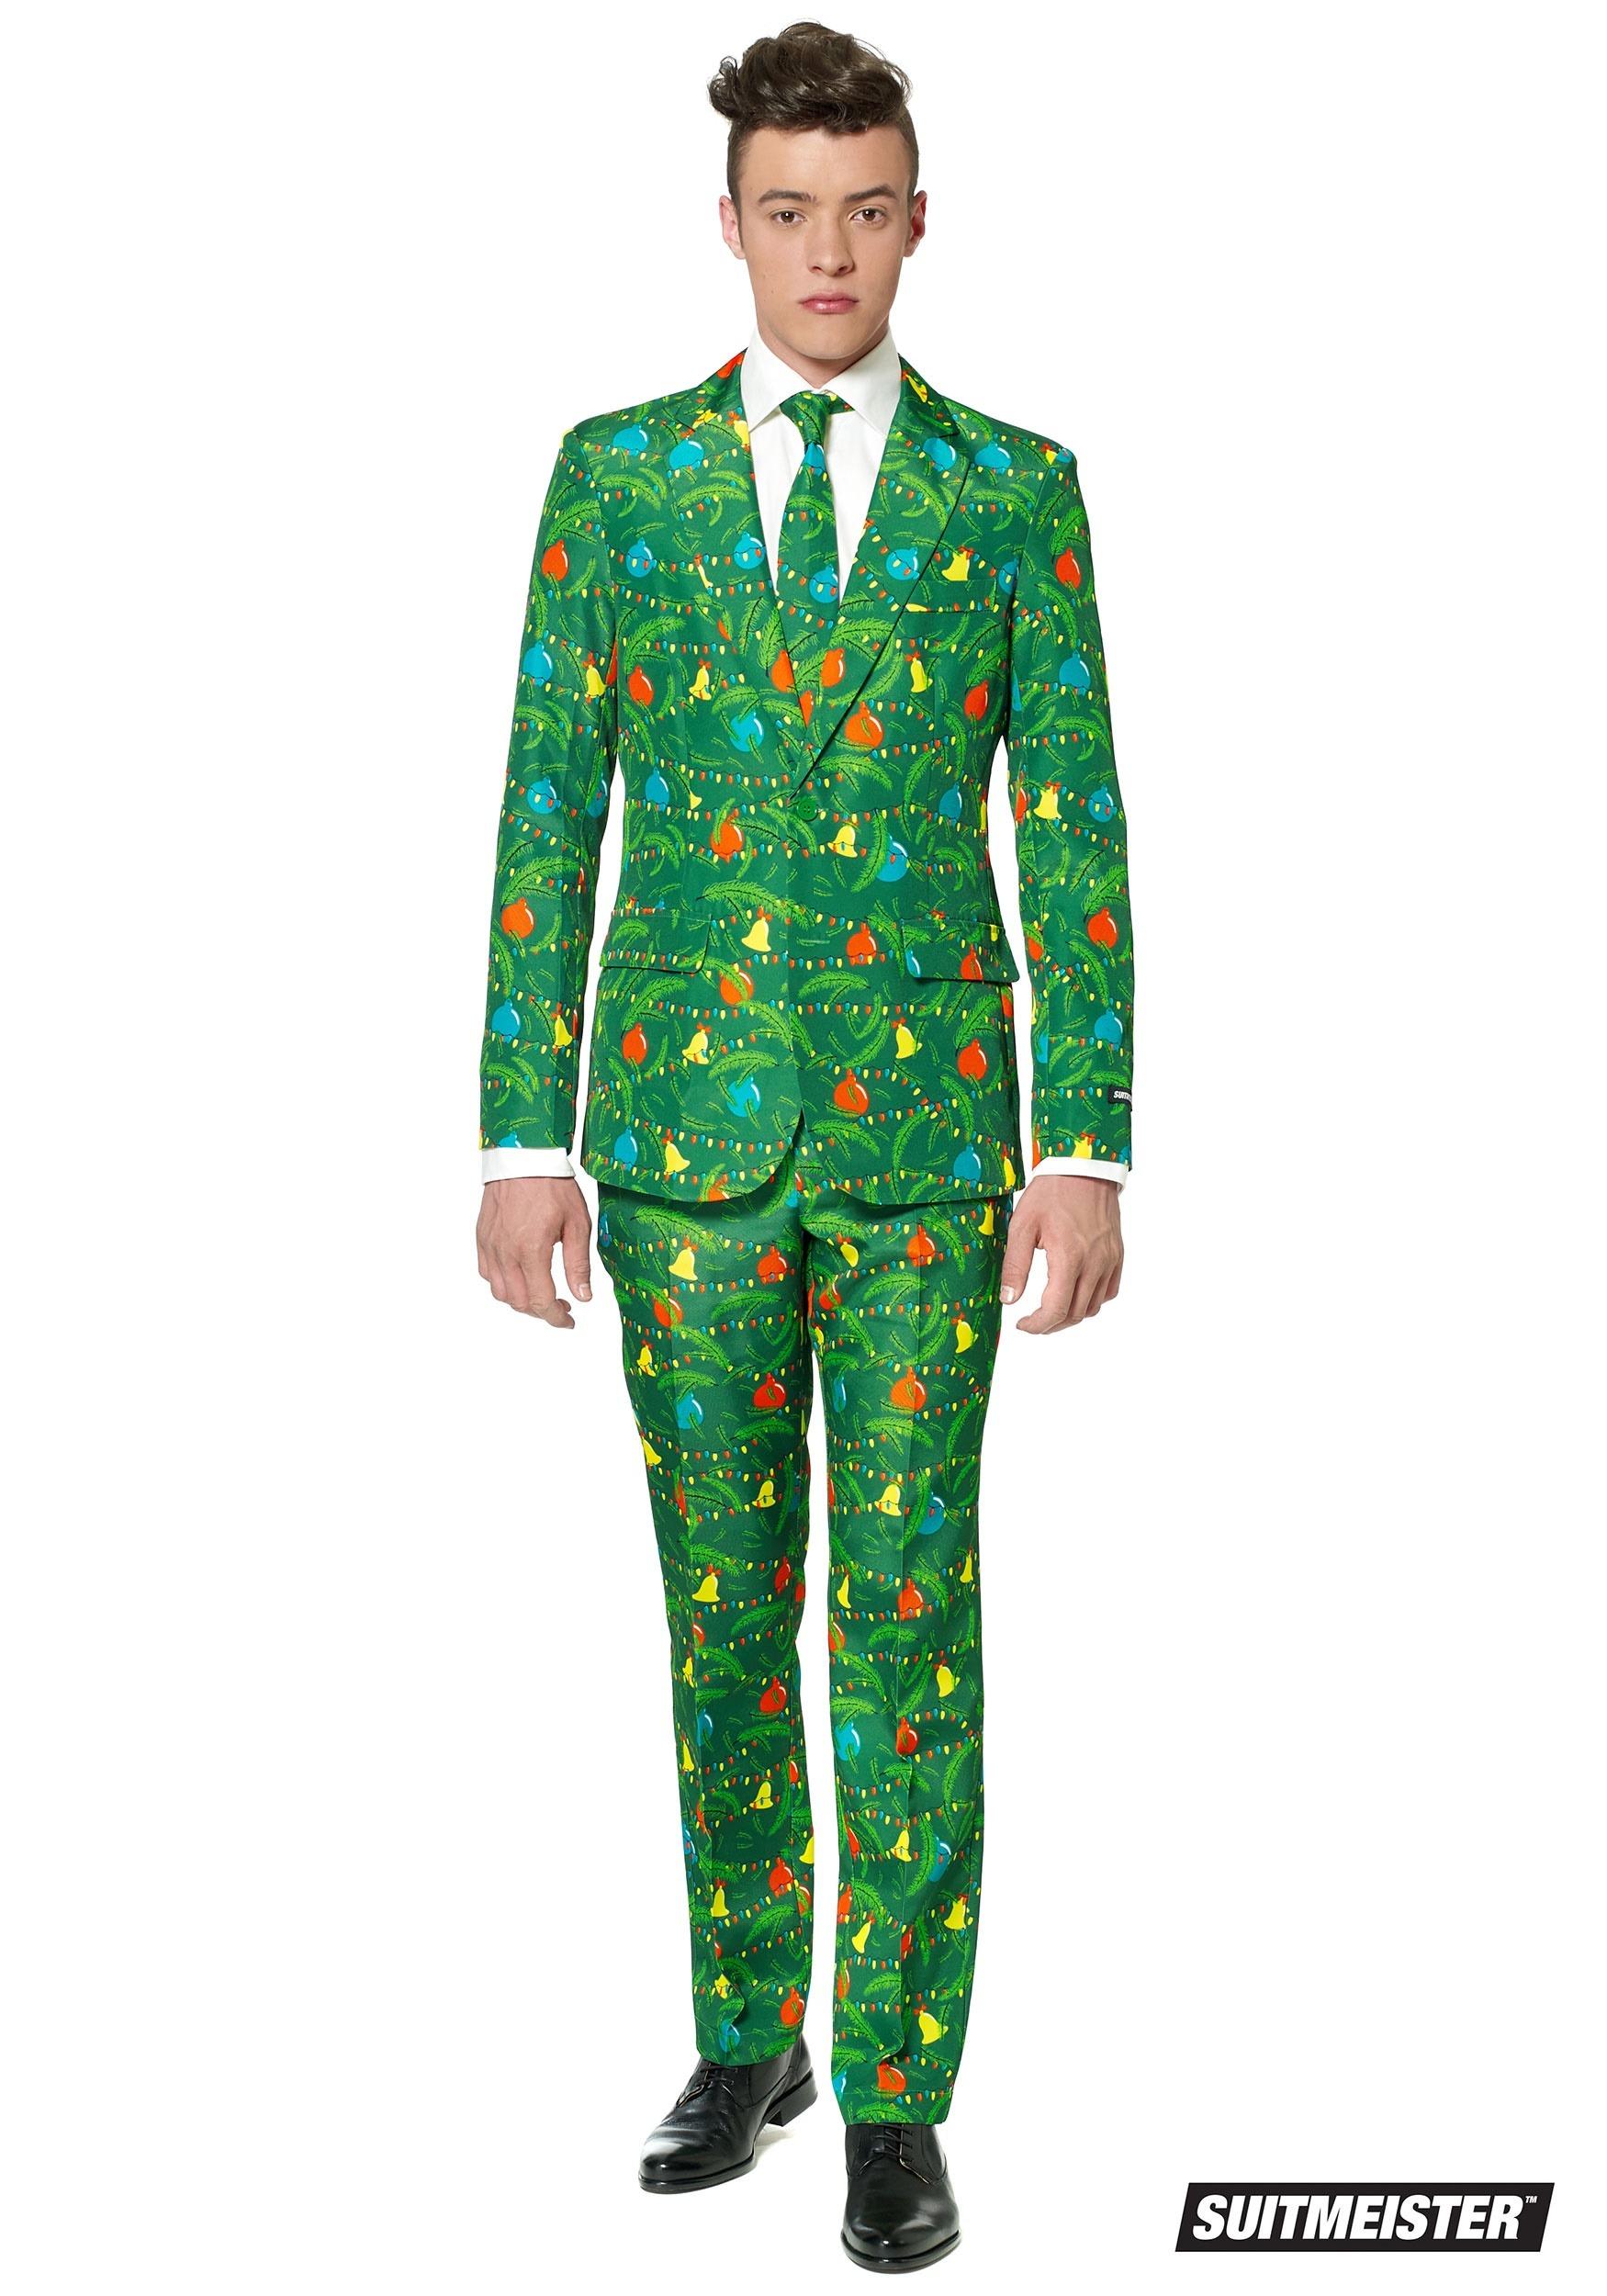 Christmas Tree Costume.Green Christmas Tree Men S Suitmeister Suit